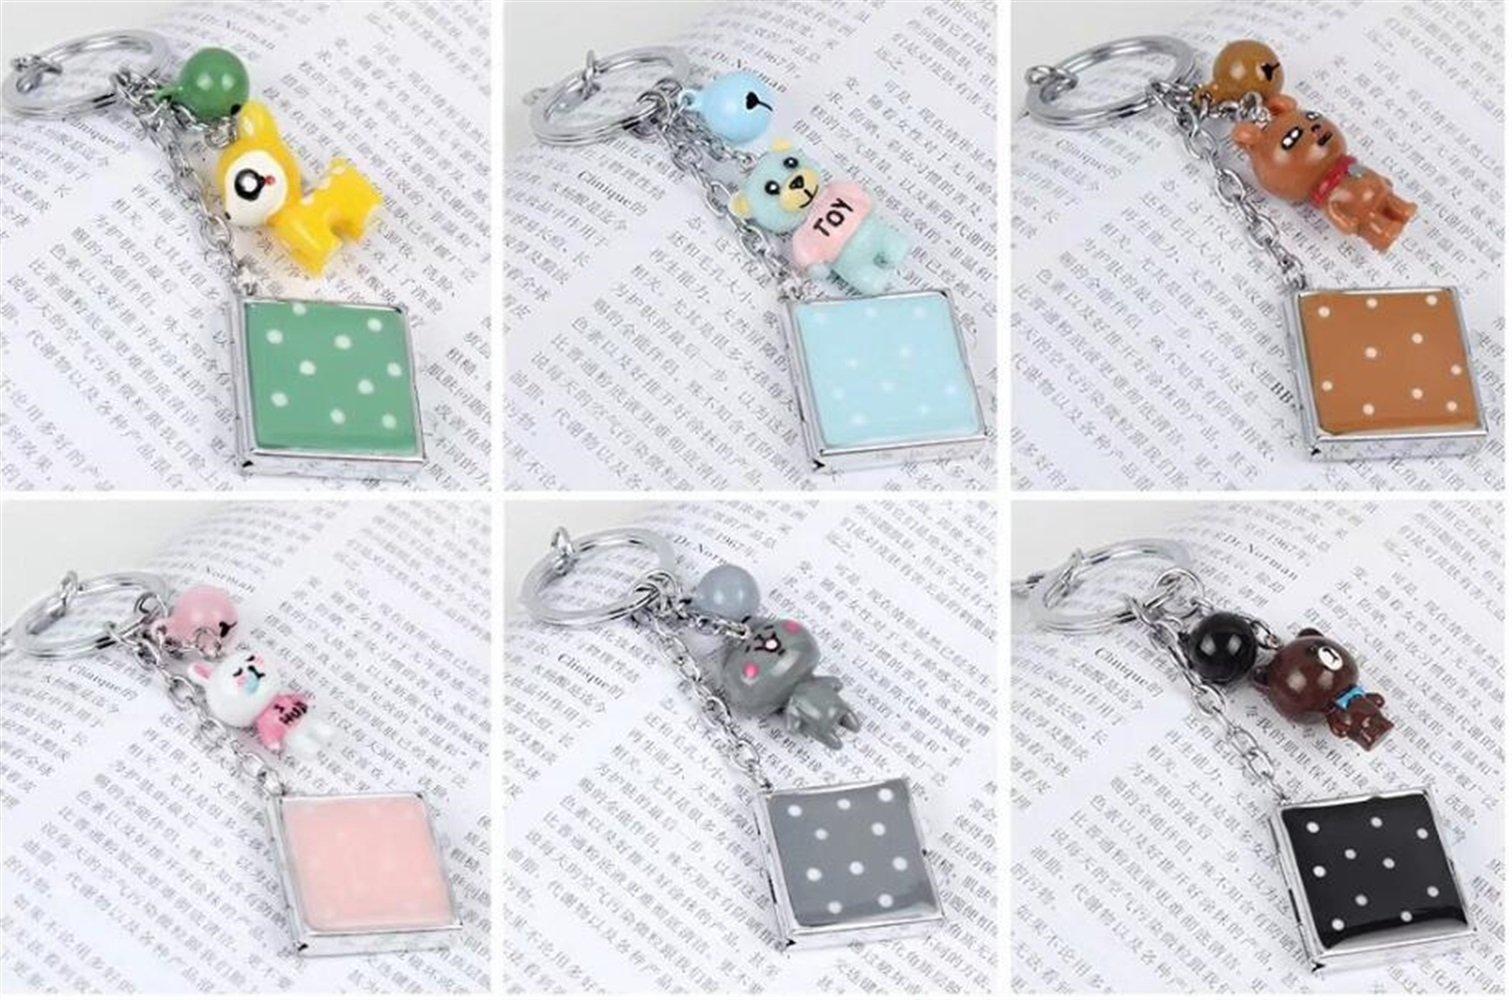 Childrens Mirror Mini Square Shape Cartoon Small Glass Mirrors for Crafts Decoration Cosmetic Accessory